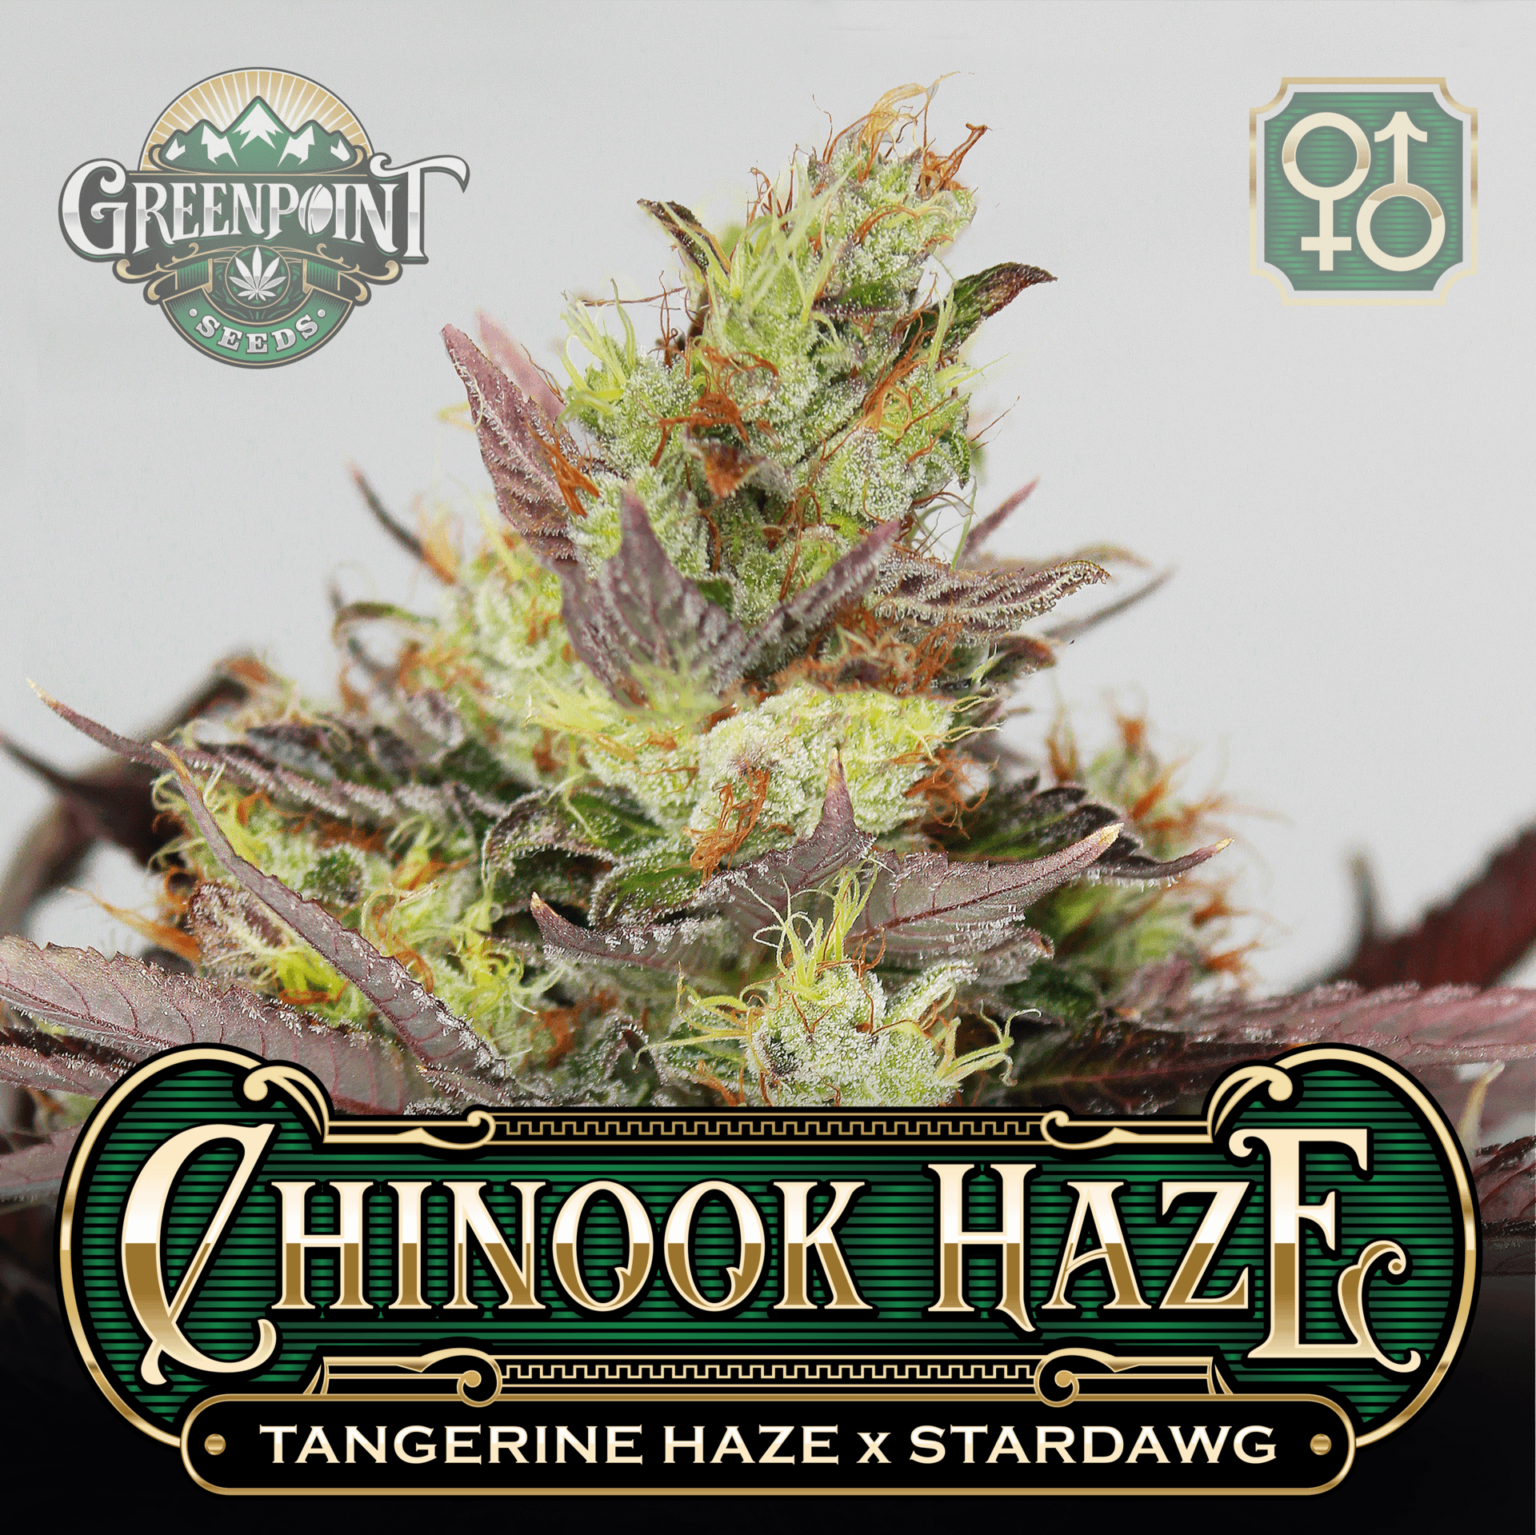 Tangerine Haze x Stardawg Seeds - Chinook Haze Cannabis Seeds - US Seed Bank